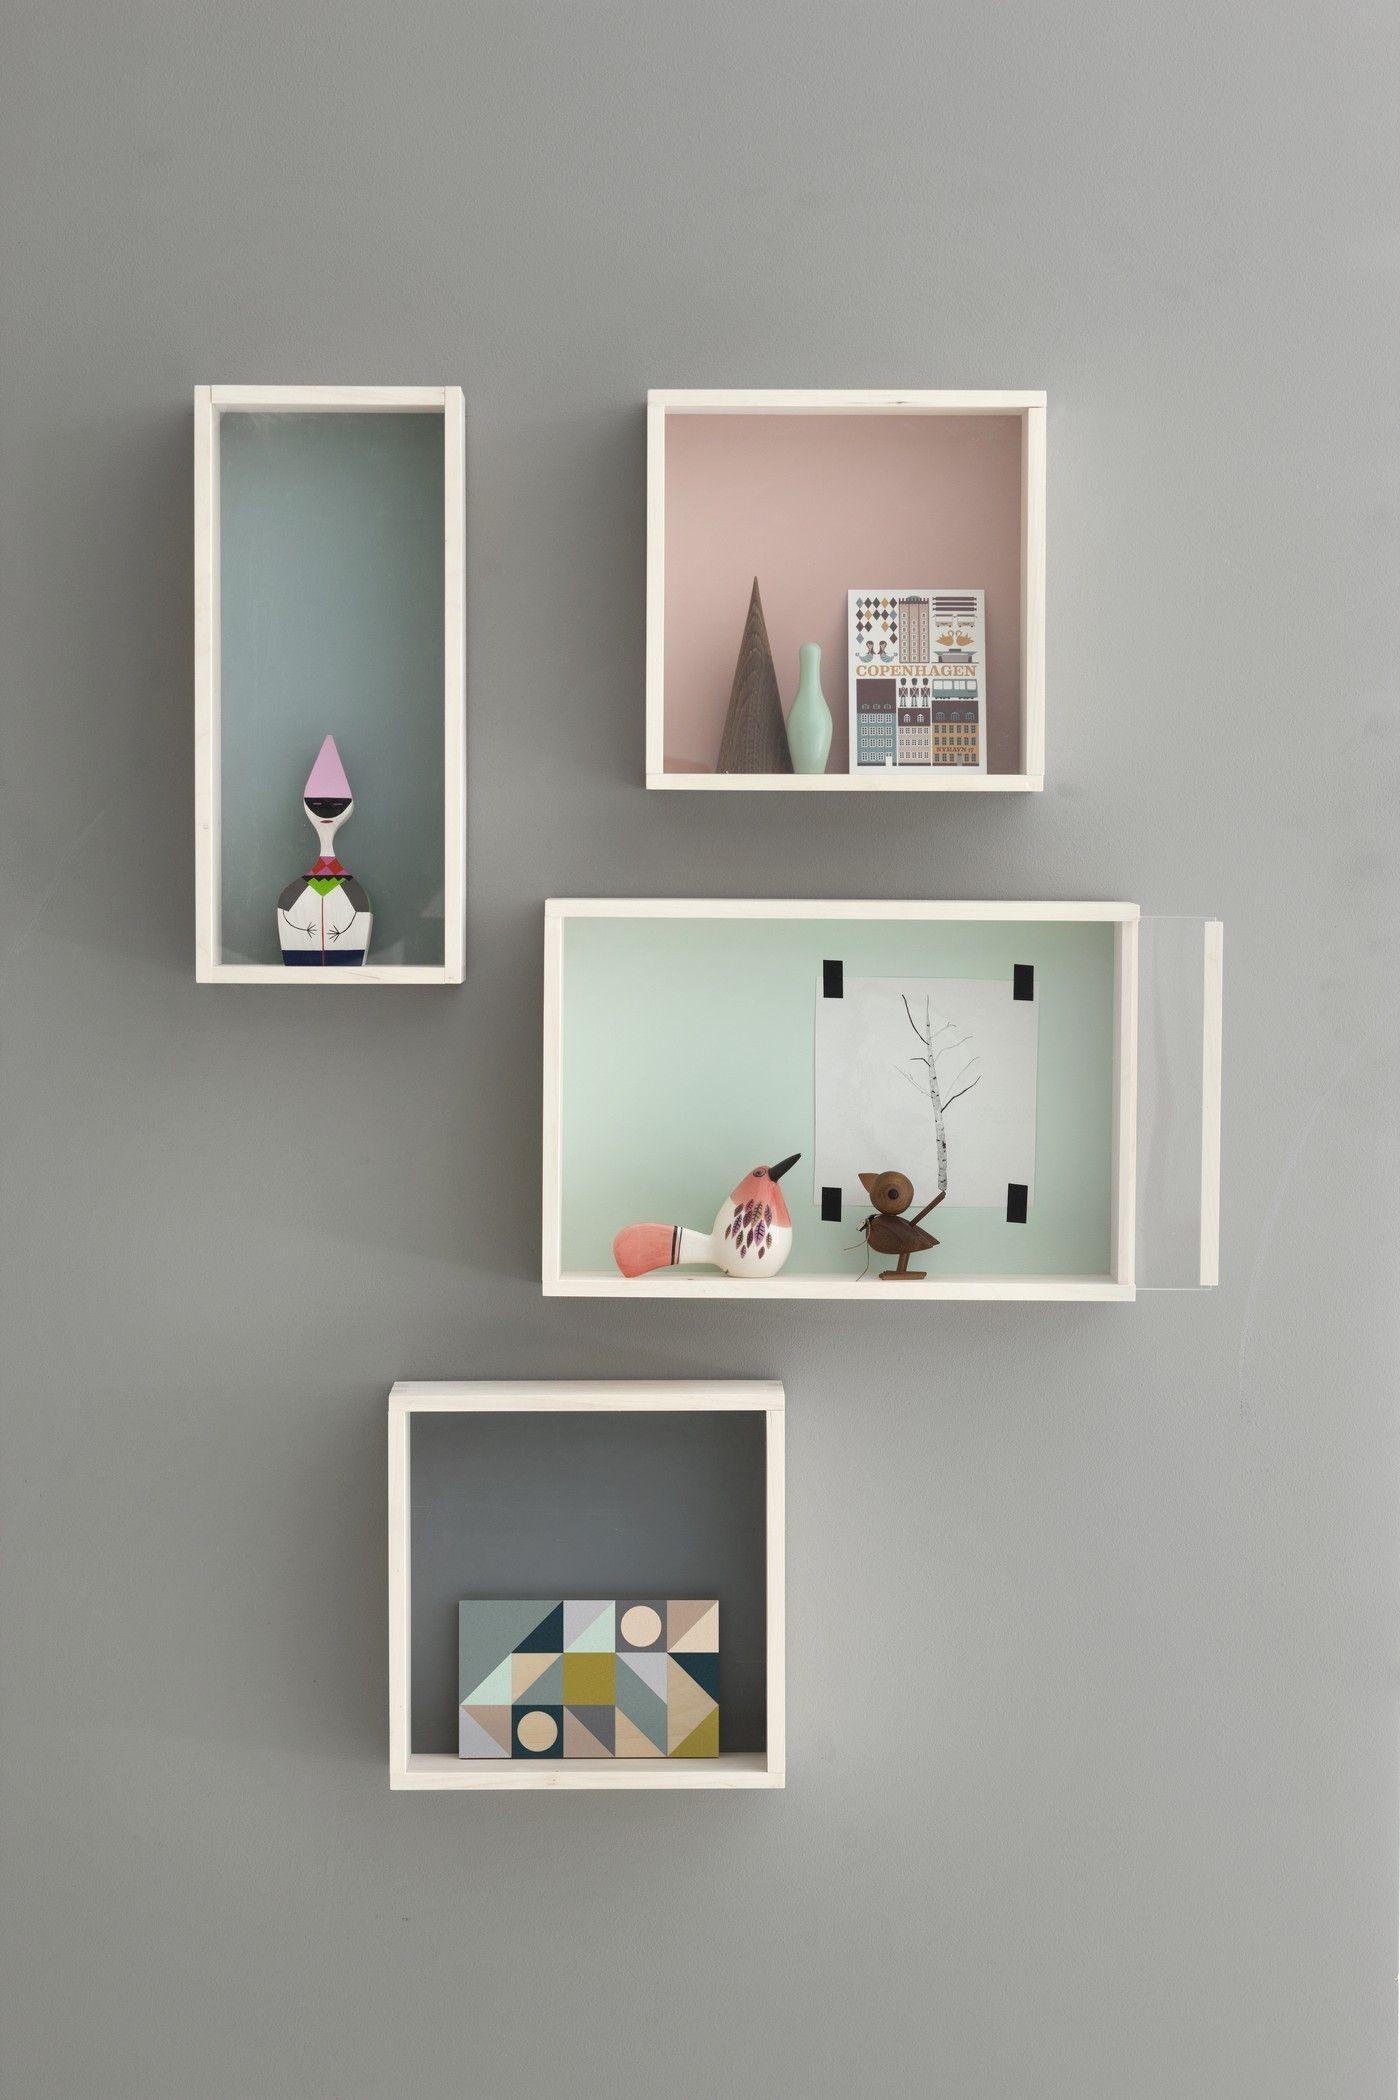 box wall gembredeg shelves bookshelves shelf art mounted ikea